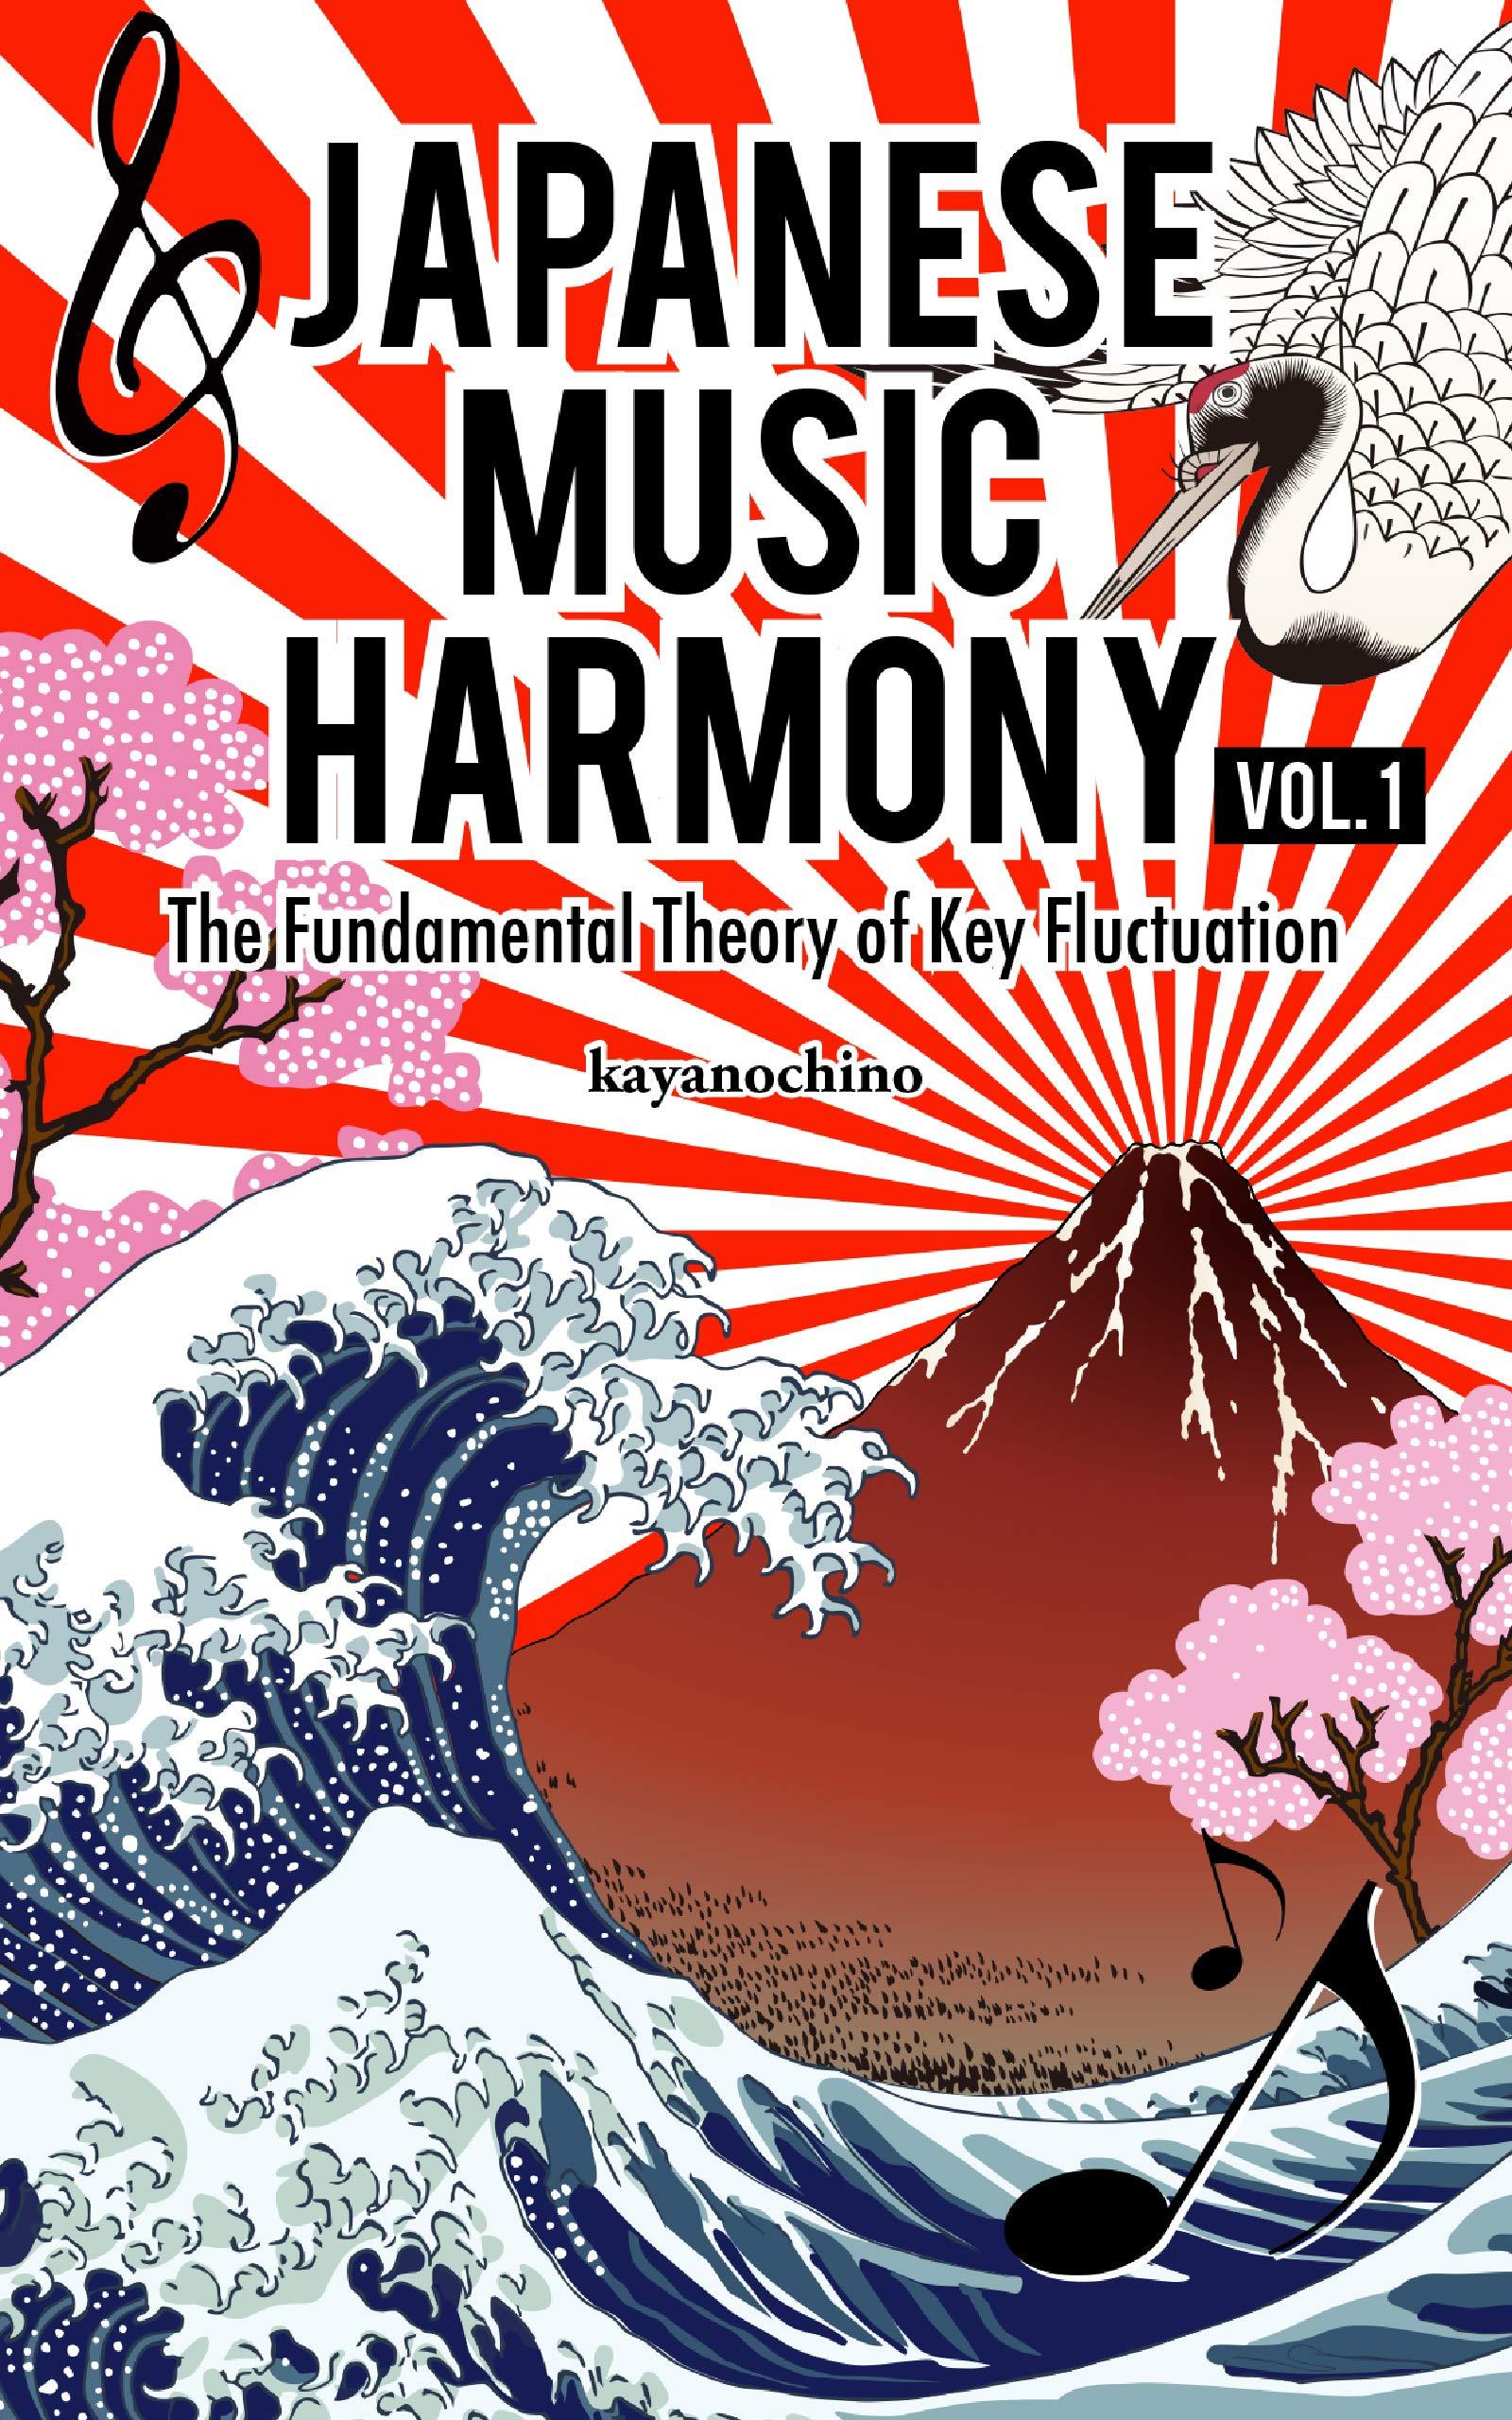 Japanese Music Harmony: The Fundamental Theory of Key Fluctuation